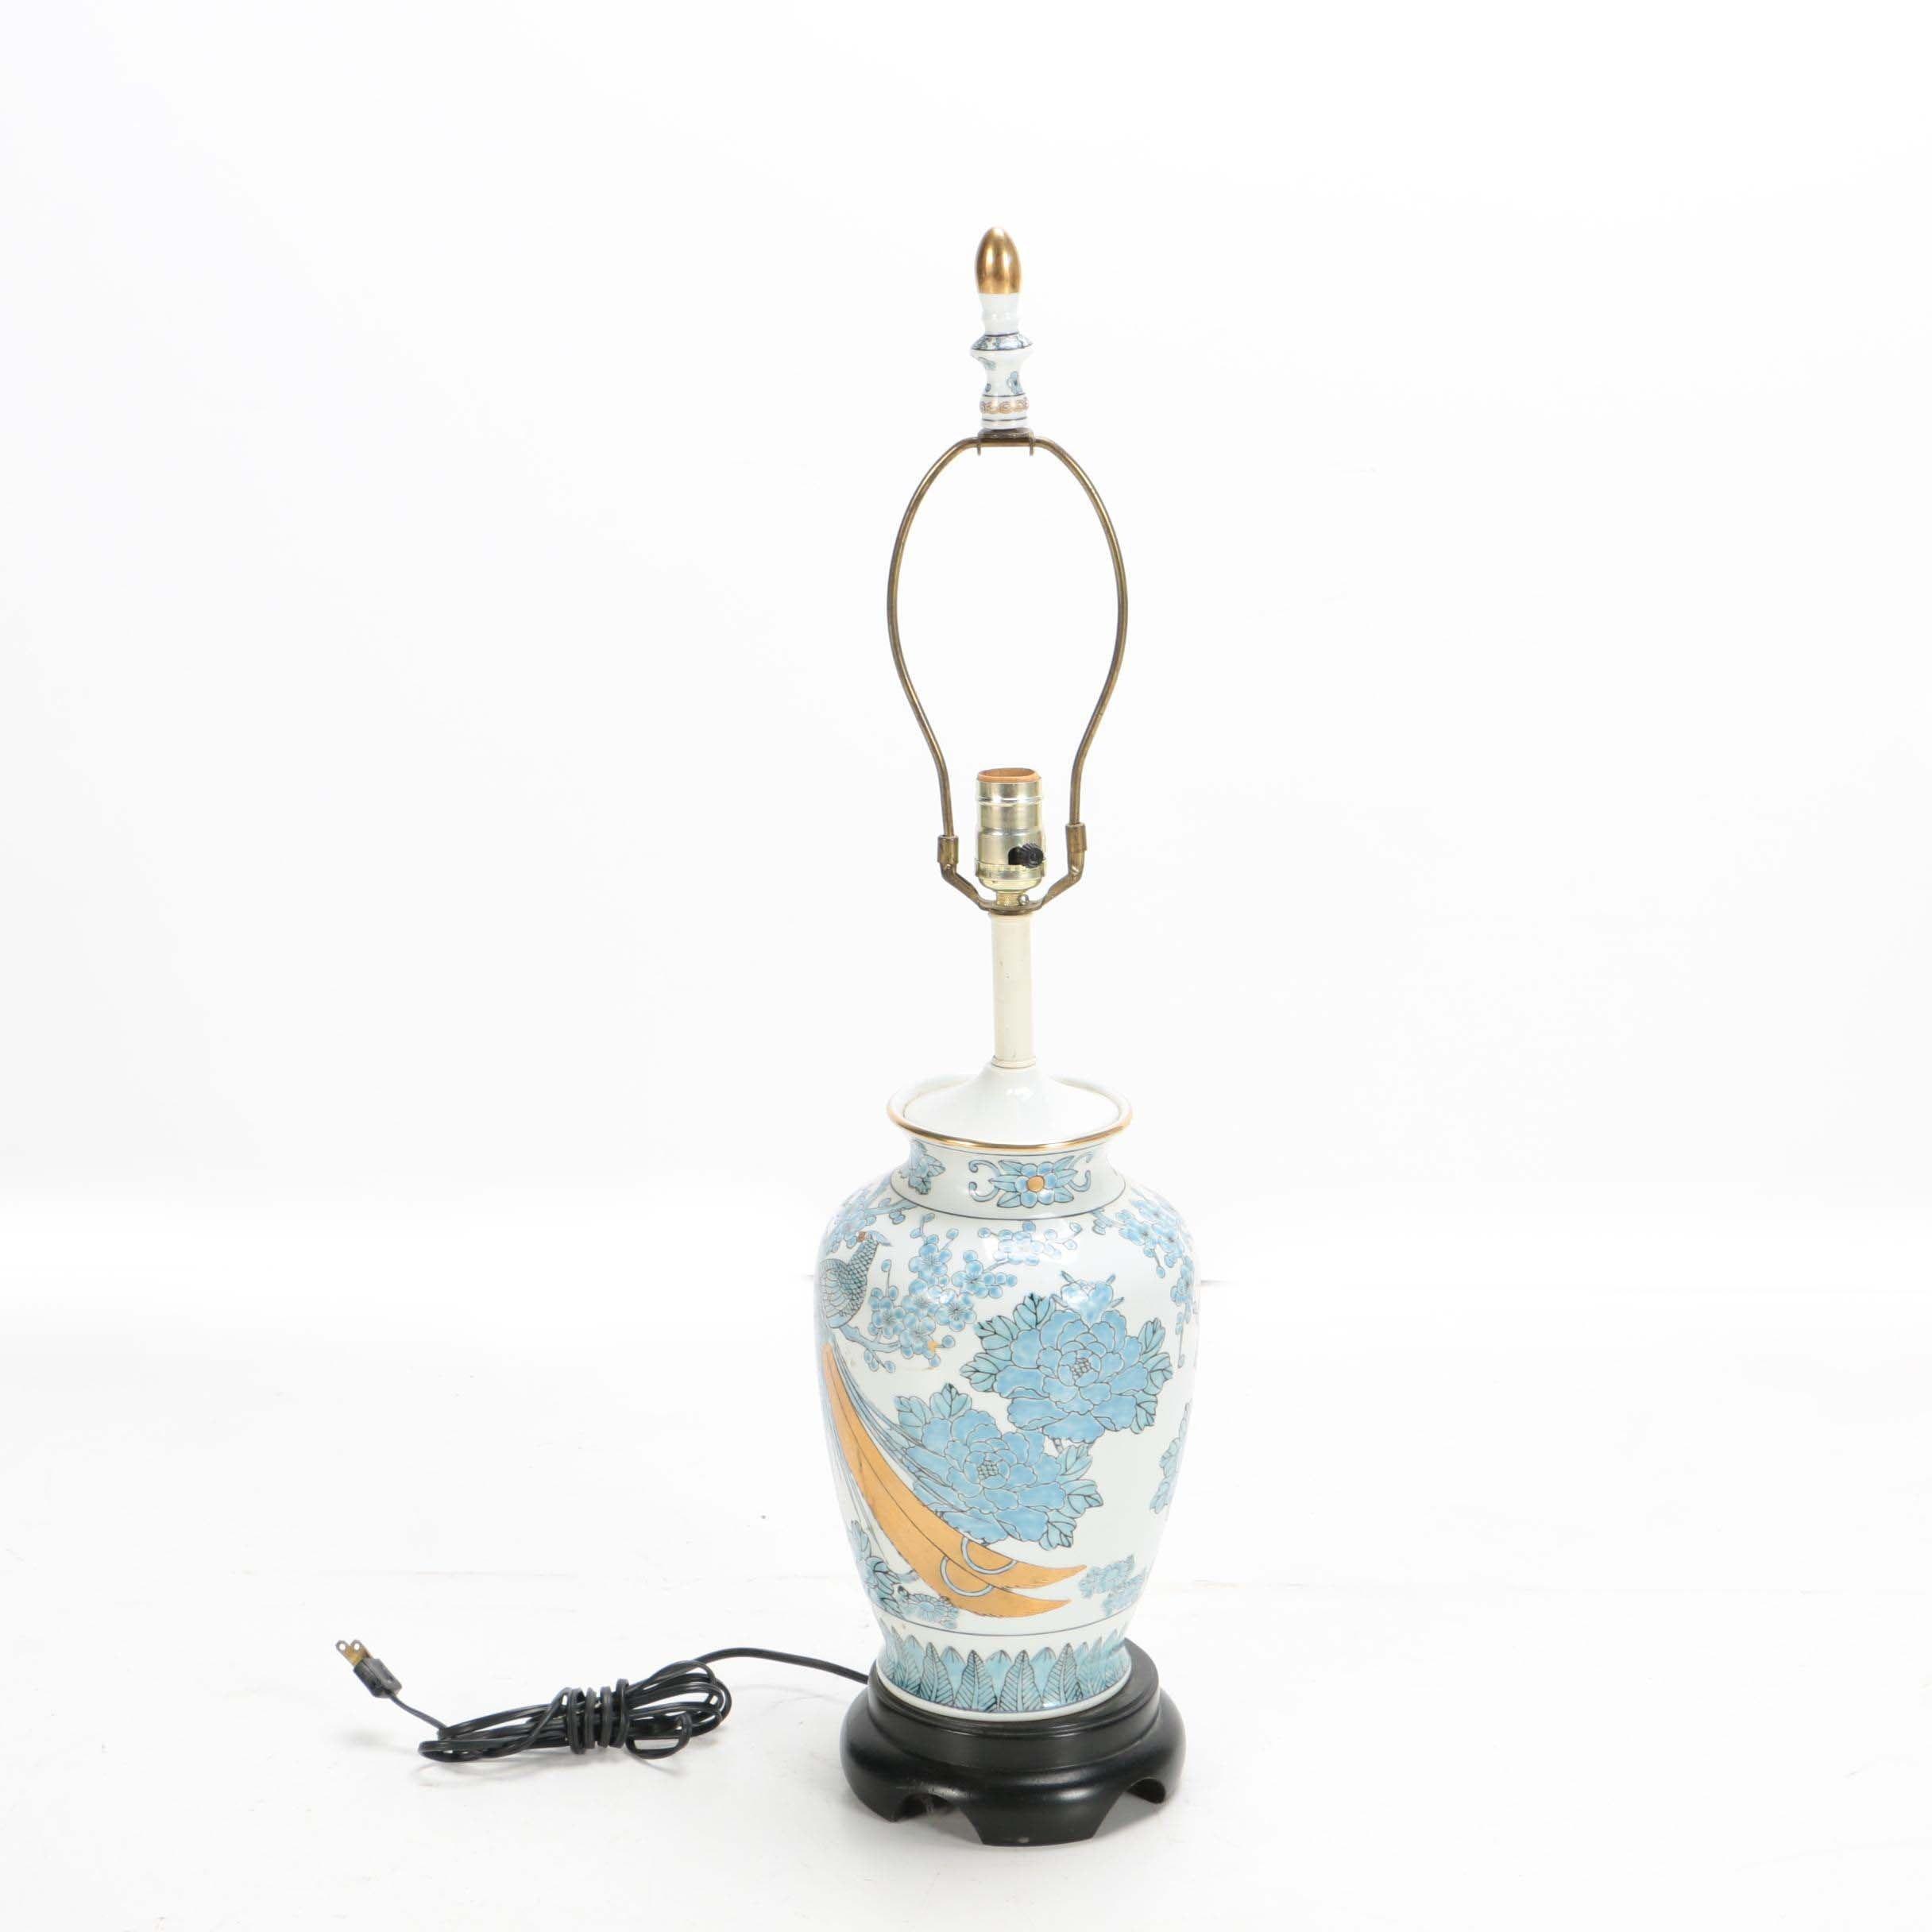 Japanese Gold Imari Ceramic Lamp with Peacocks and Chrysanthemums